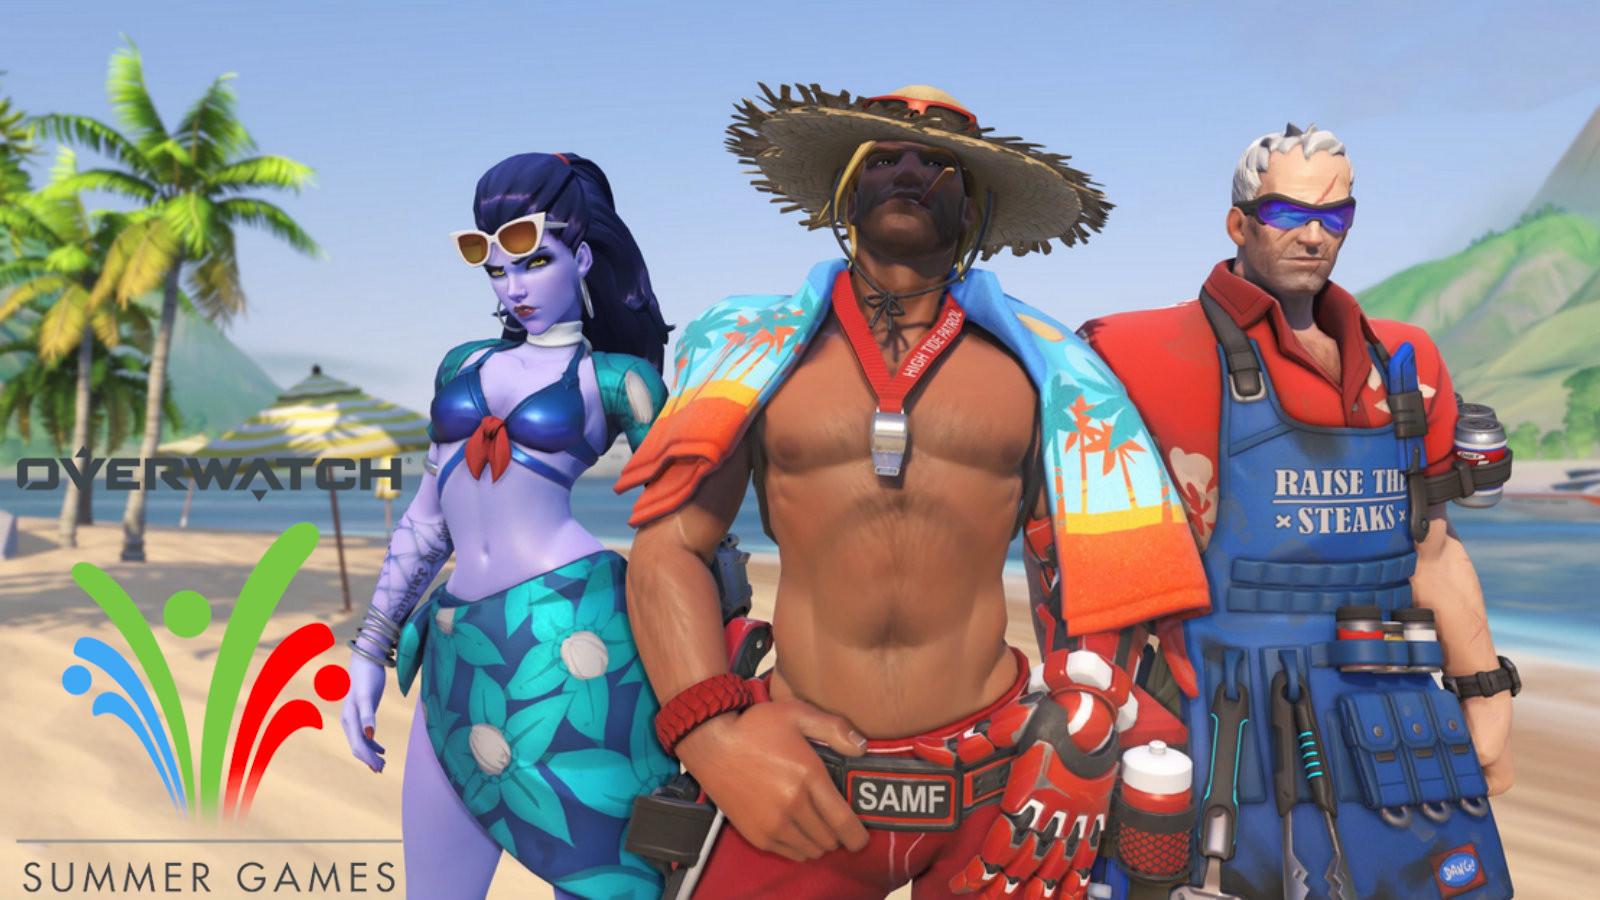 Overwatch Summer Games screen